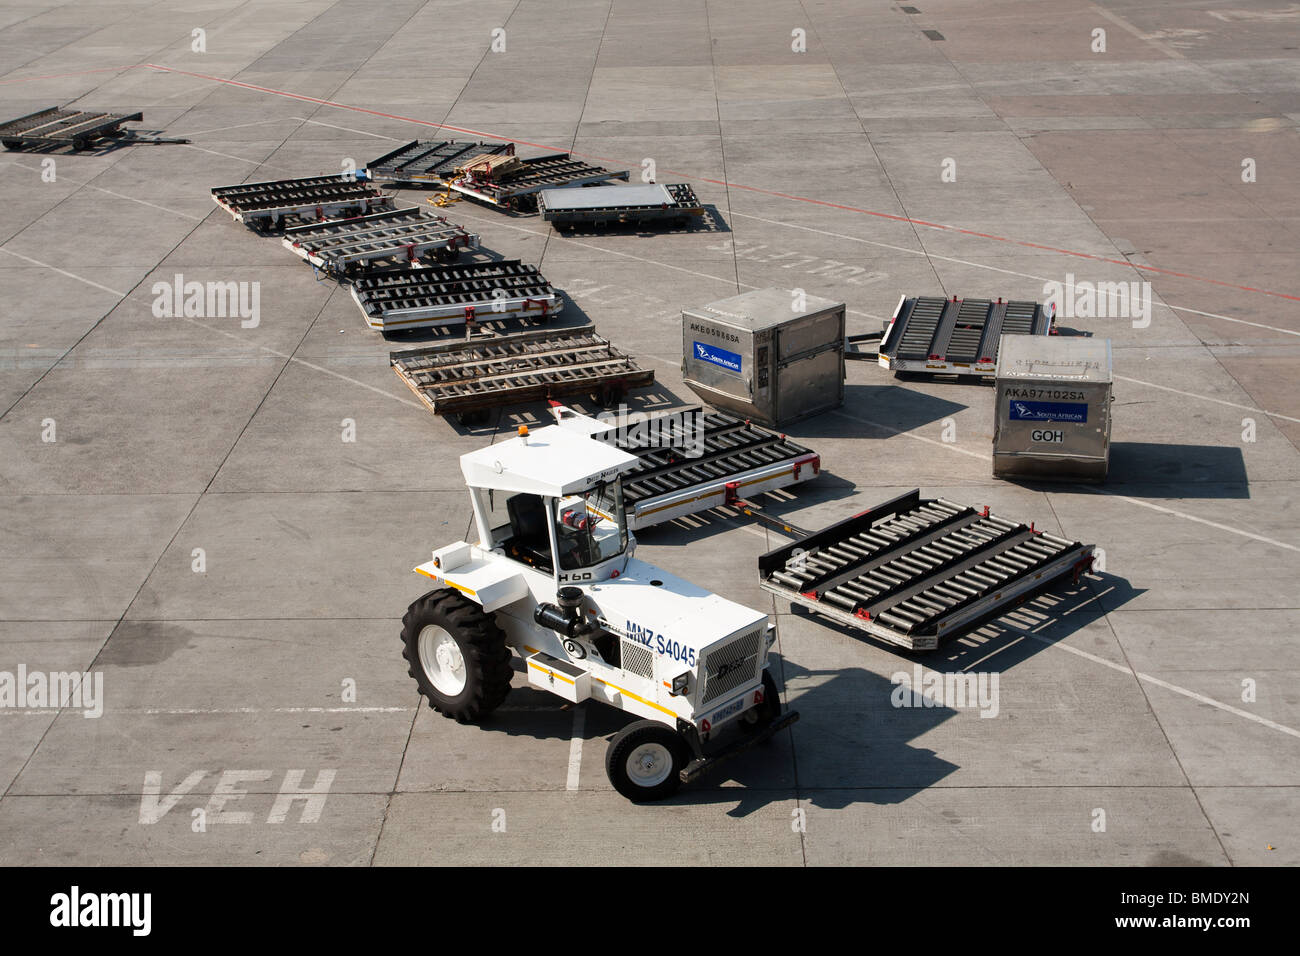 Baggage tractor, O.R. Tambo International Airport, formerly Johannesburg International Airport, South Africa - Stock Image